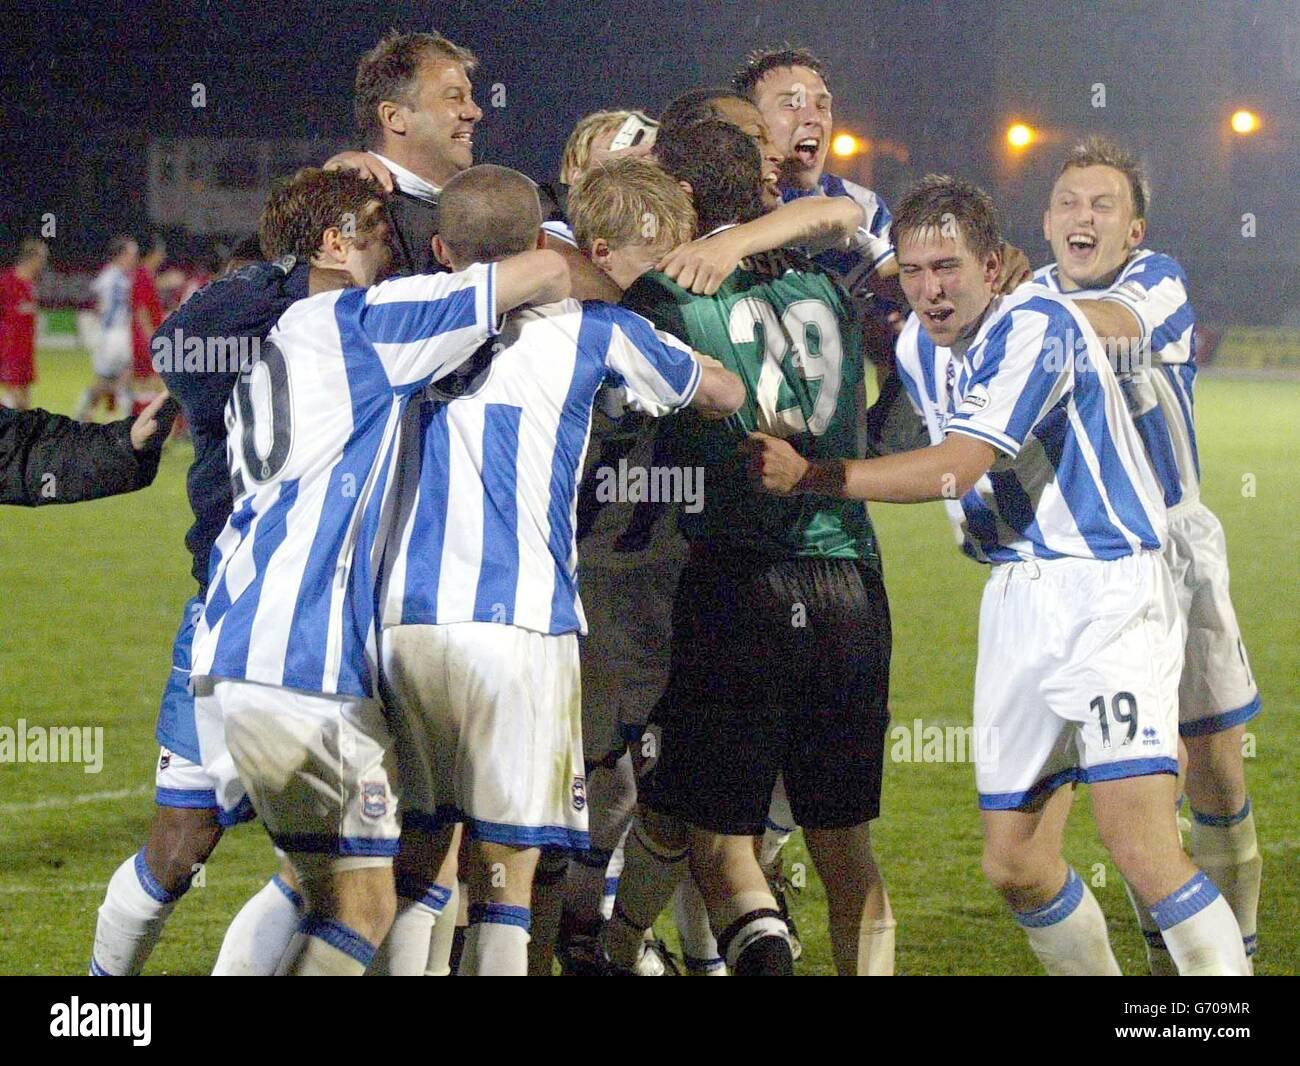 Swindon Town Football Club Stadium Stock Photos & Swindon